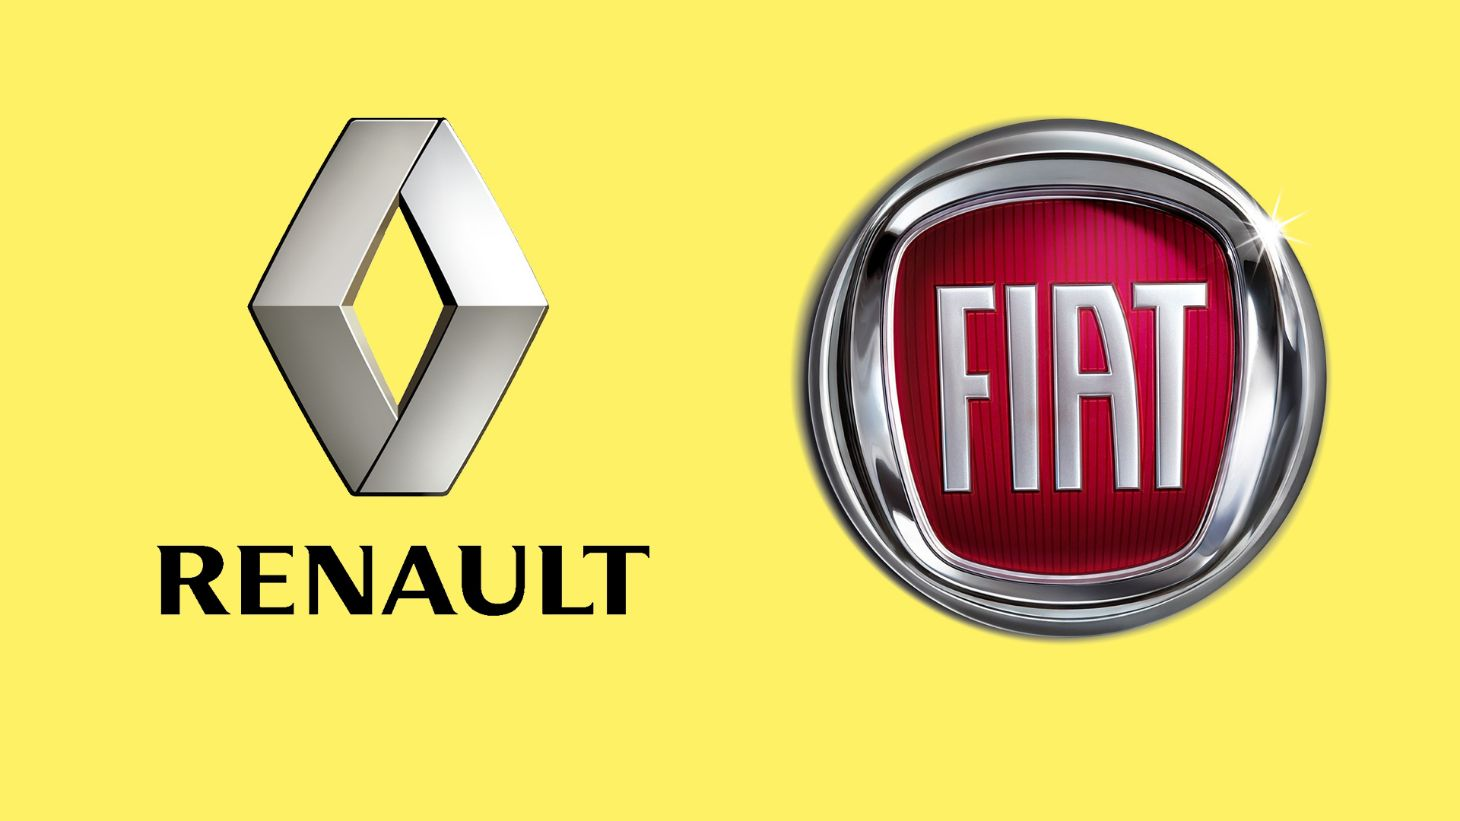 Fiat-Renault